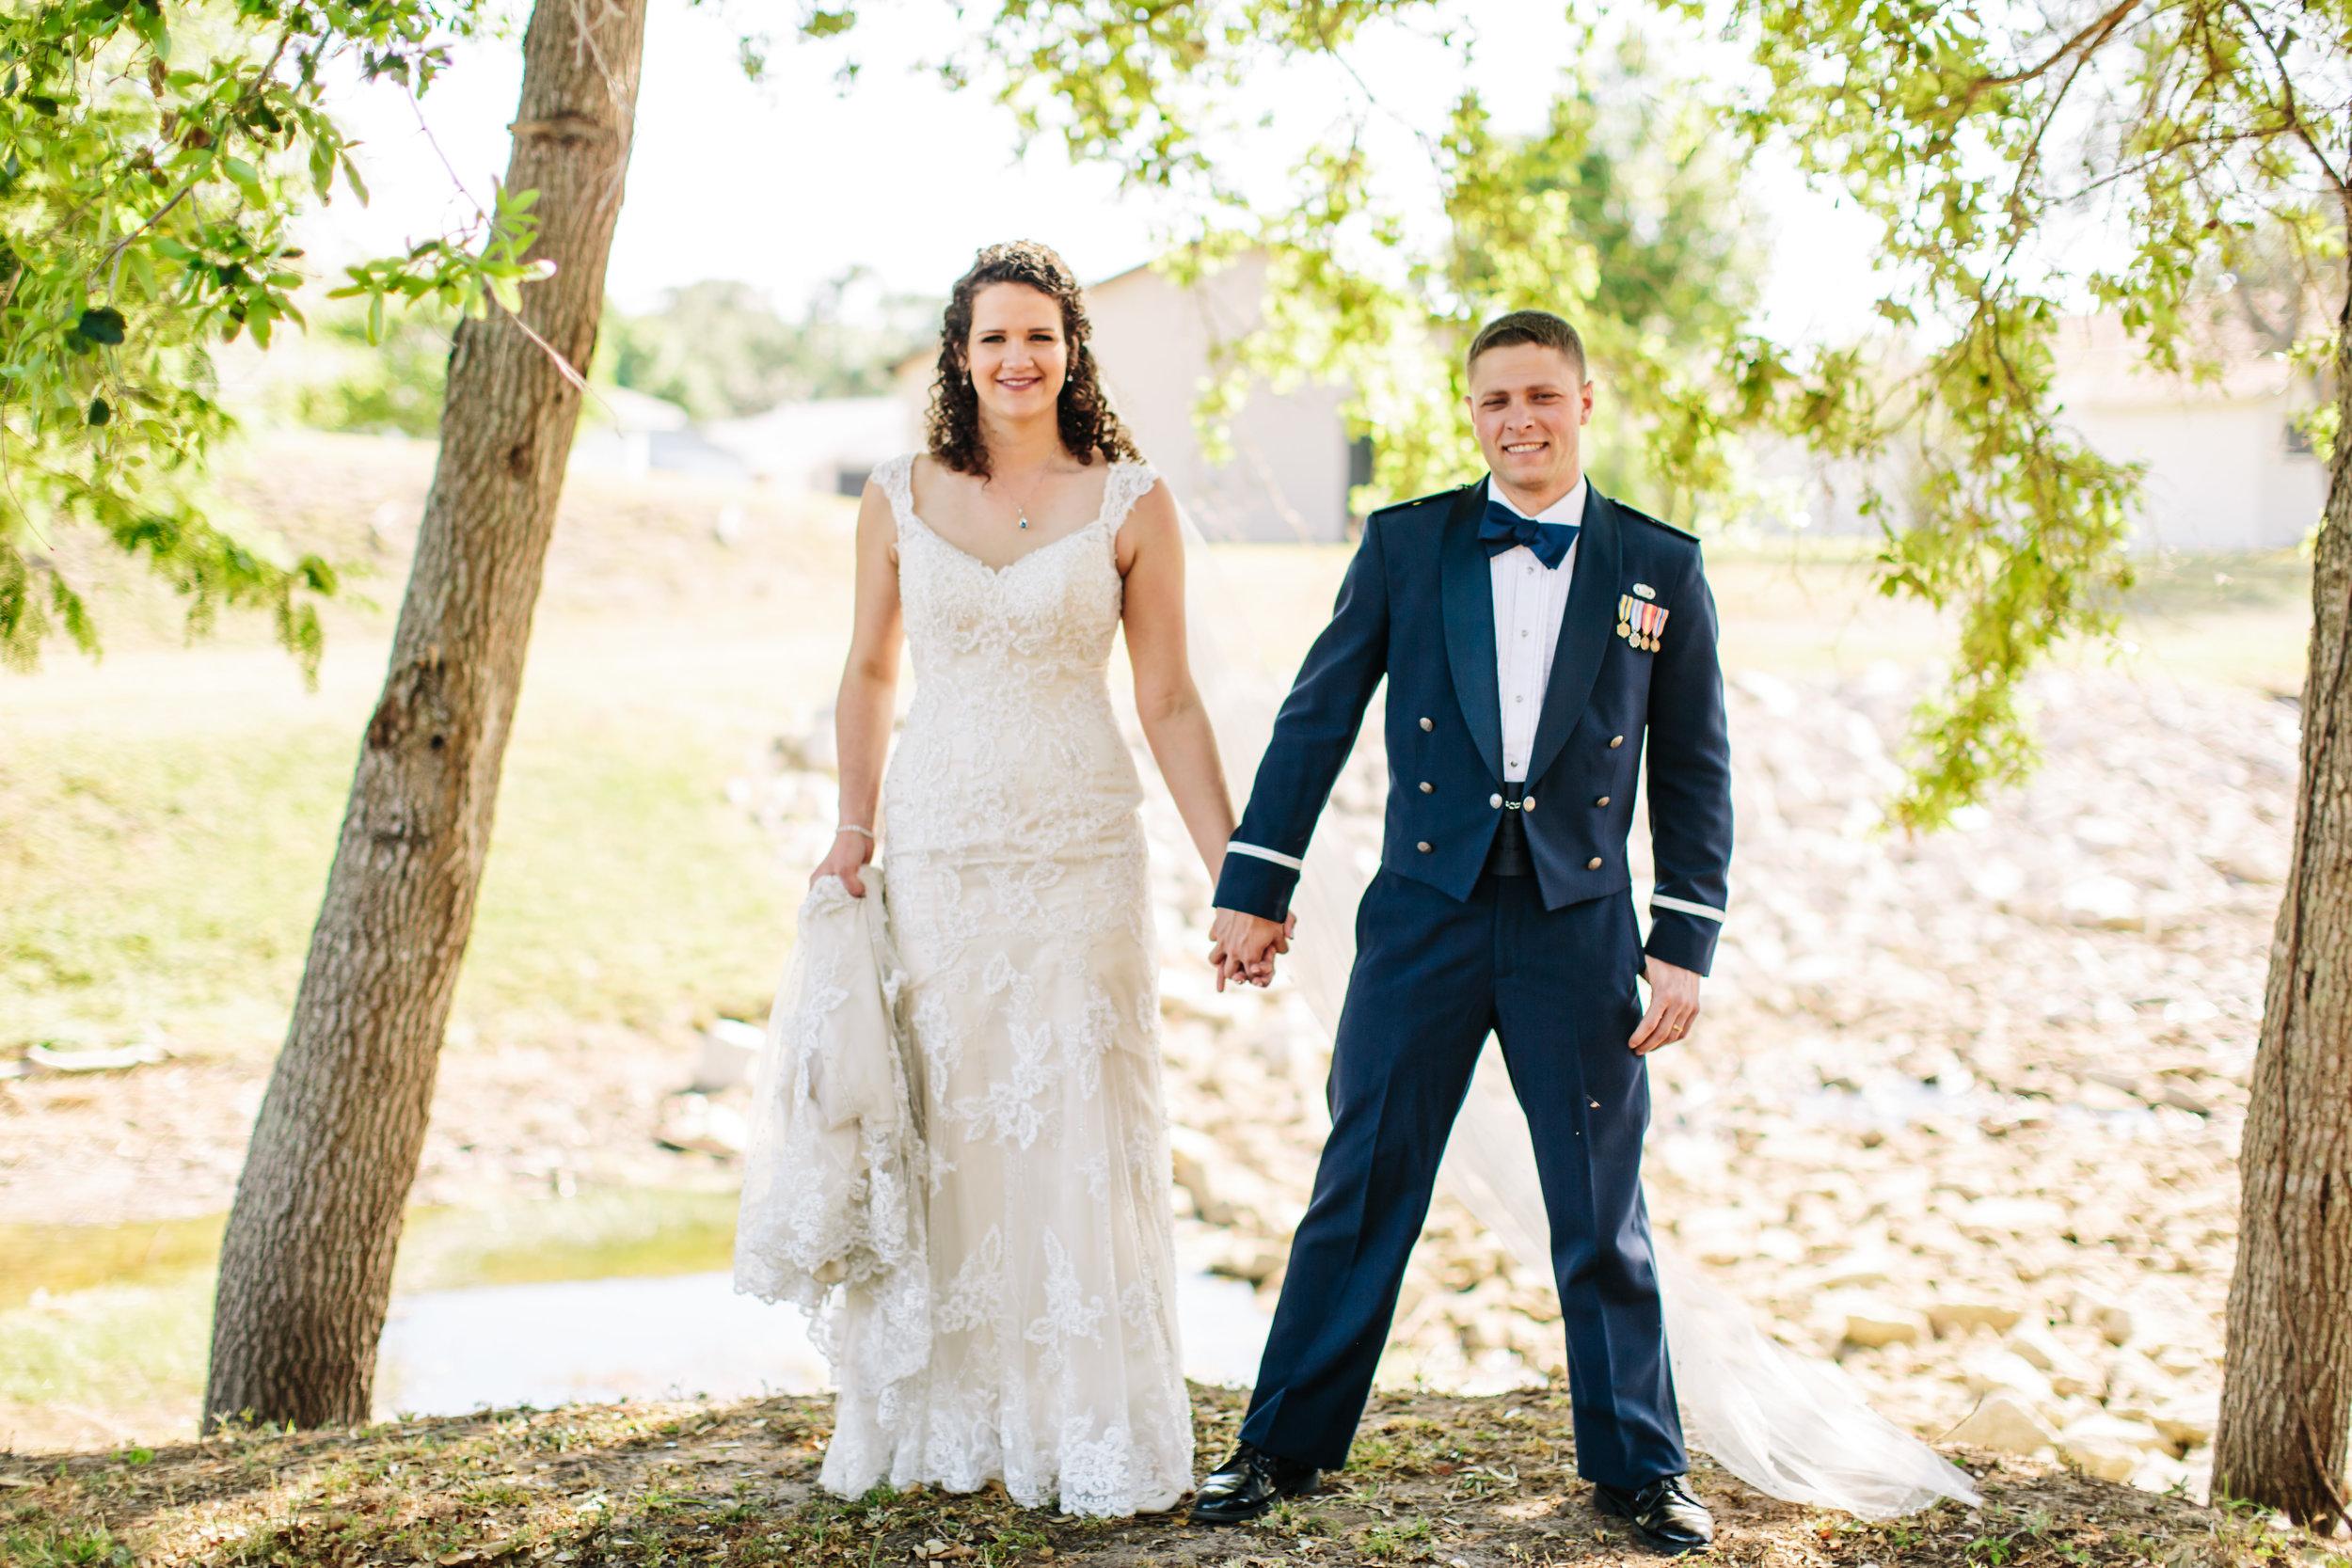 2018.03.17 Allison and Chuck Wedding Waelti Melbourne (519 of 569).jpg